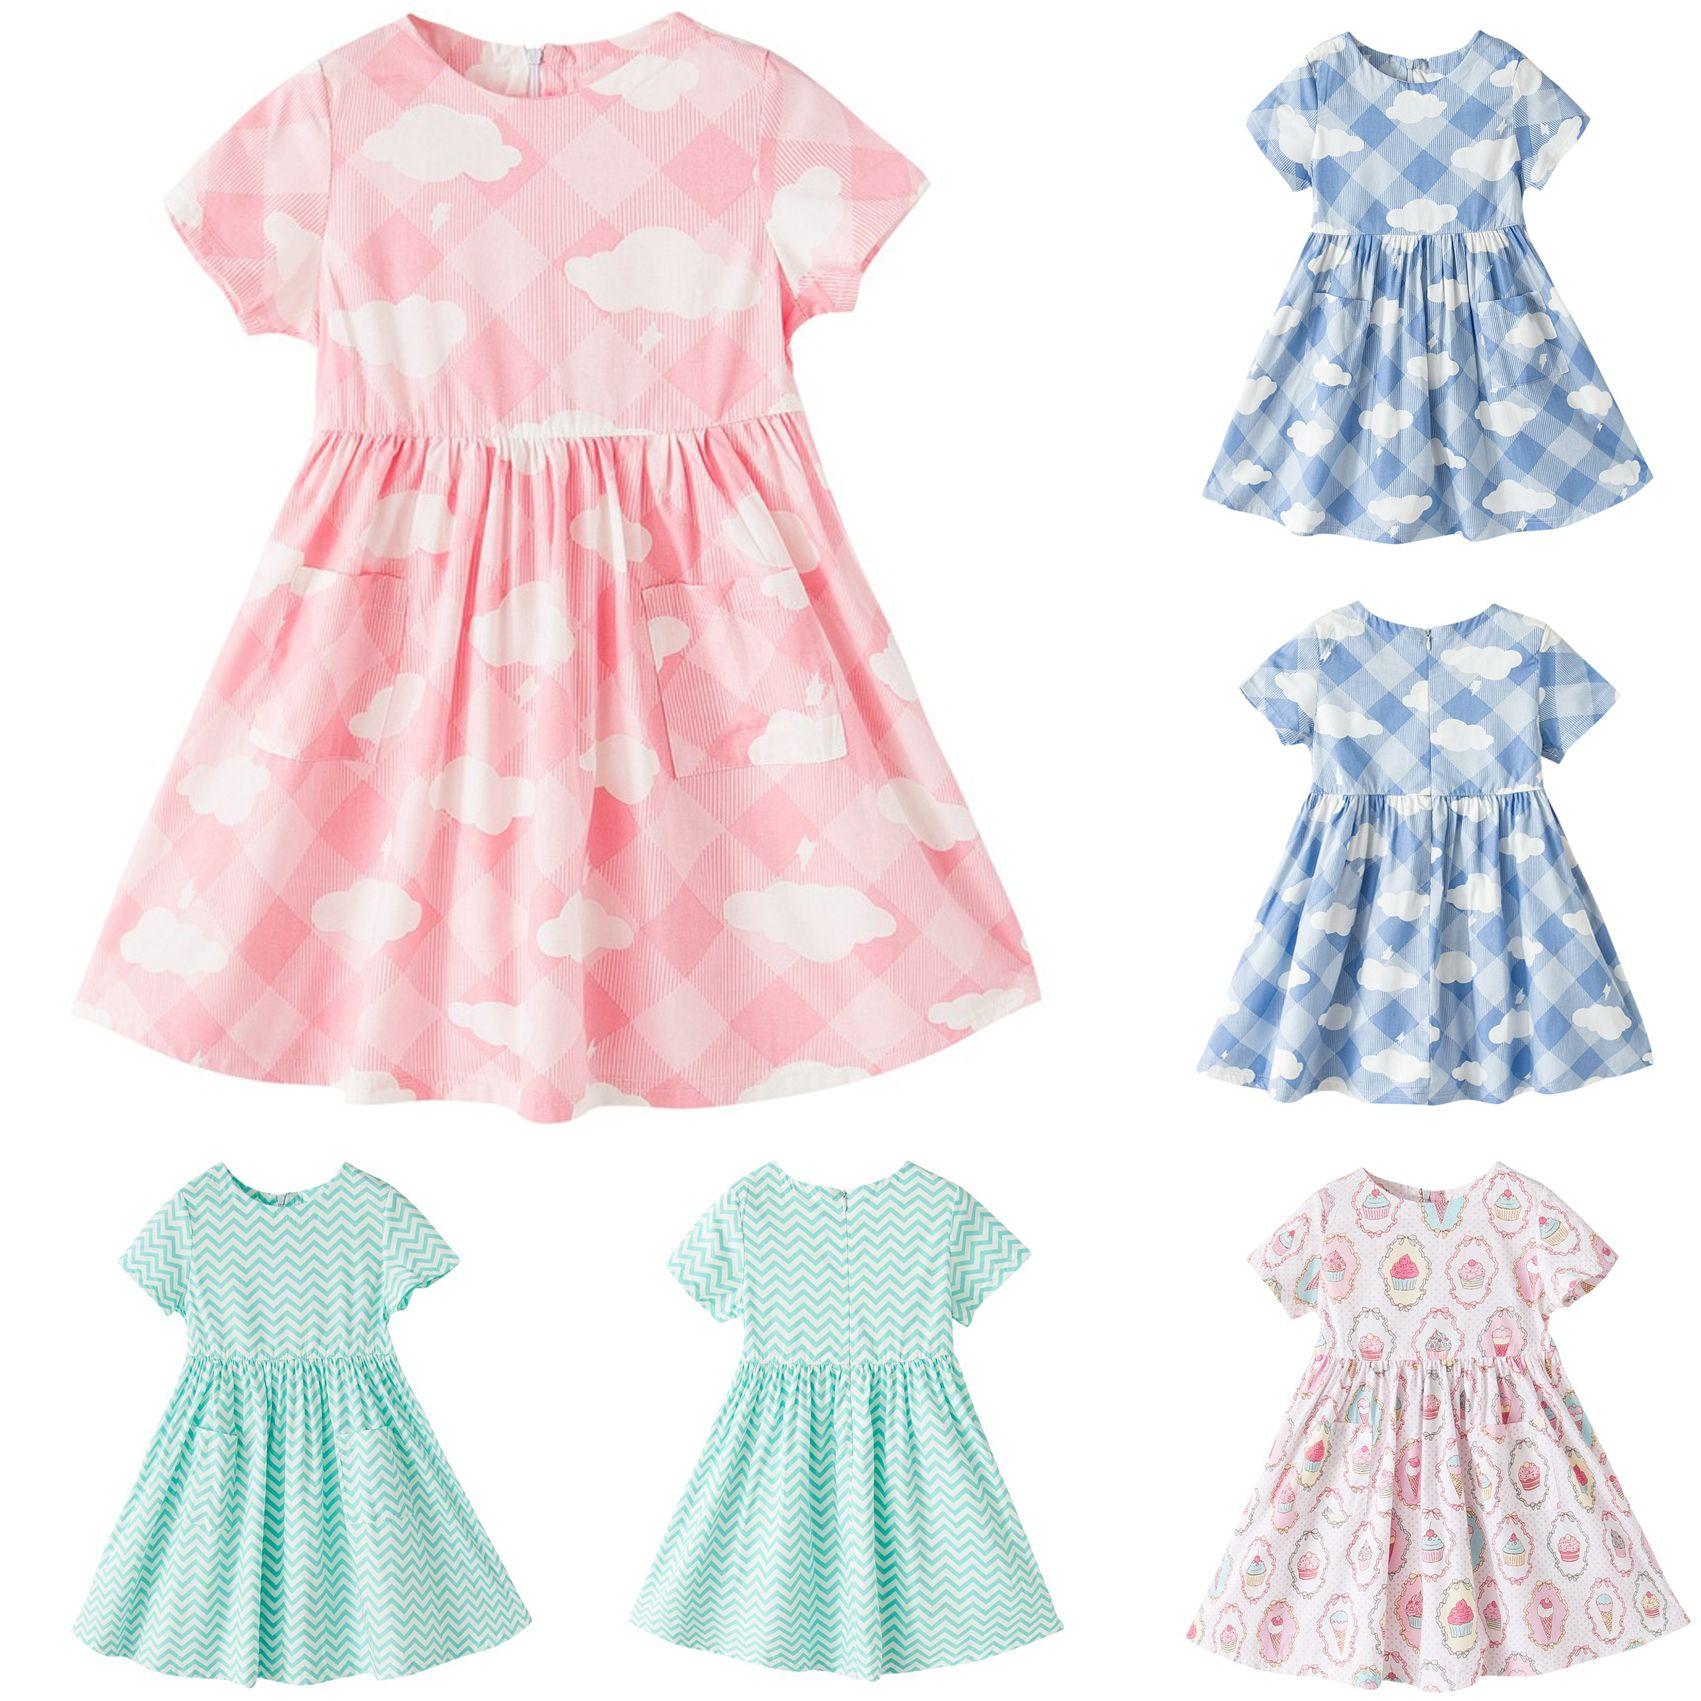 2018 Girls Dresses Cotton Girls Printed Summer Dress Size 1 12 Year